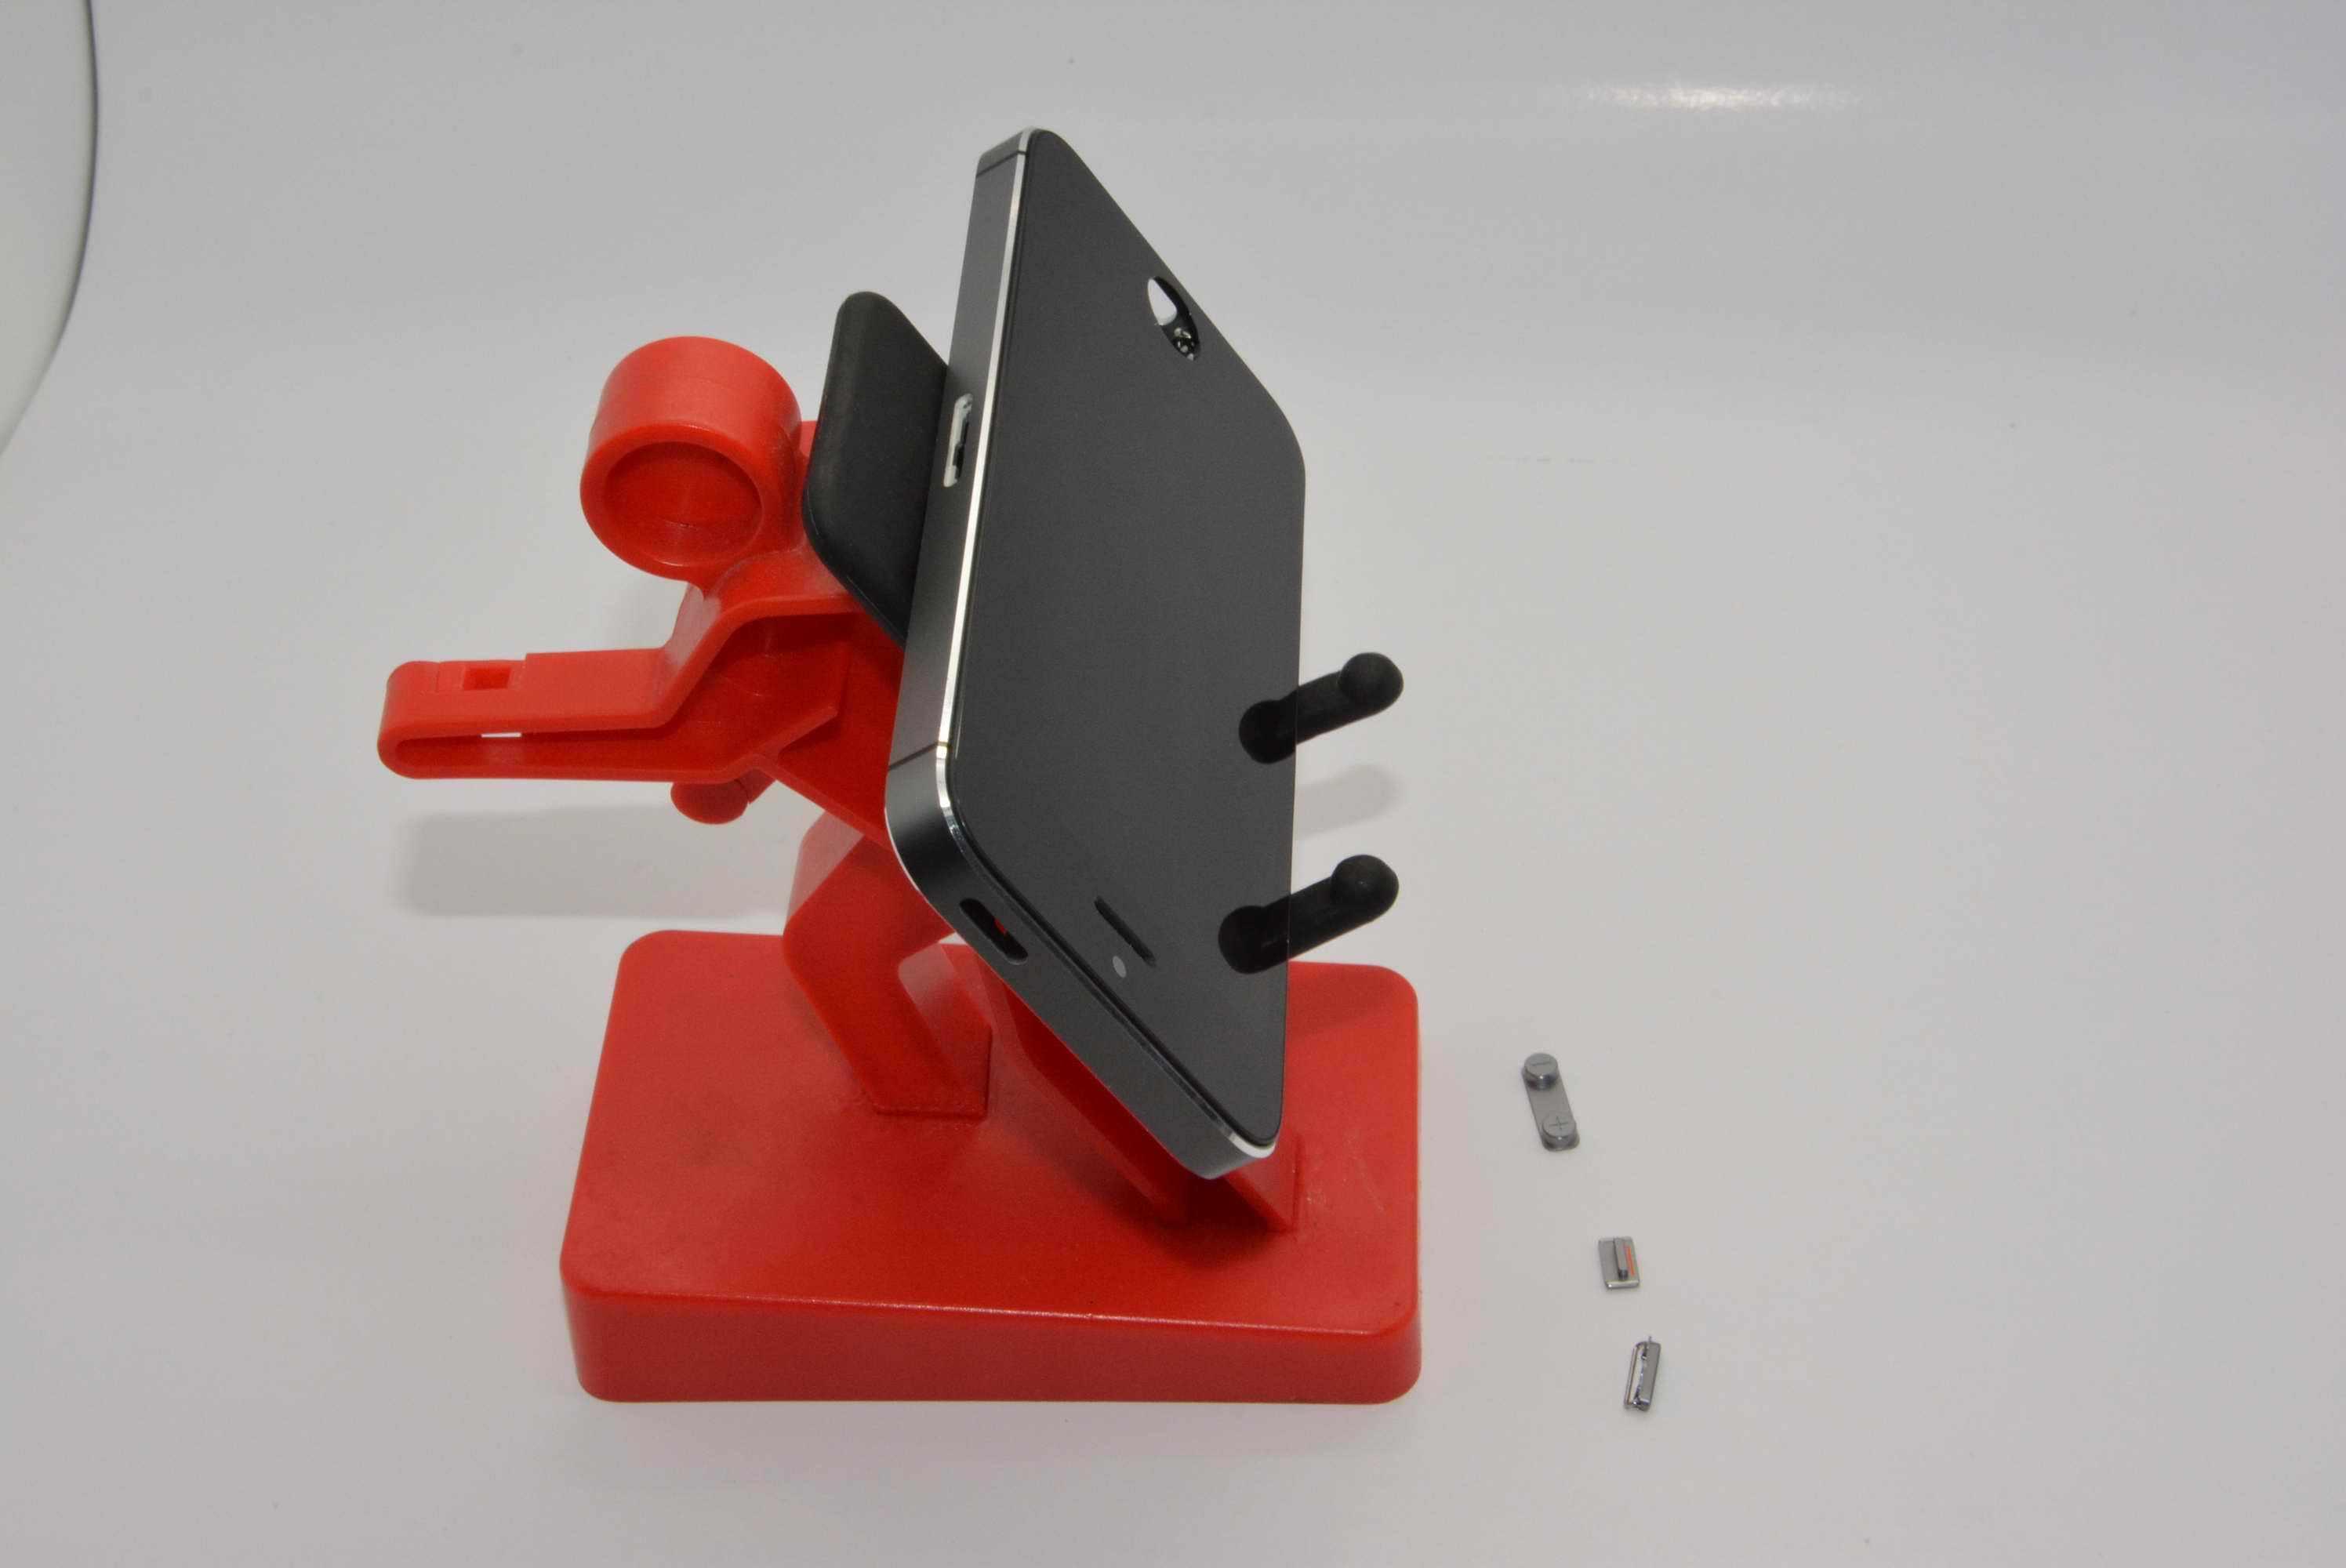 iPhone 5S Graphite : une huitième image